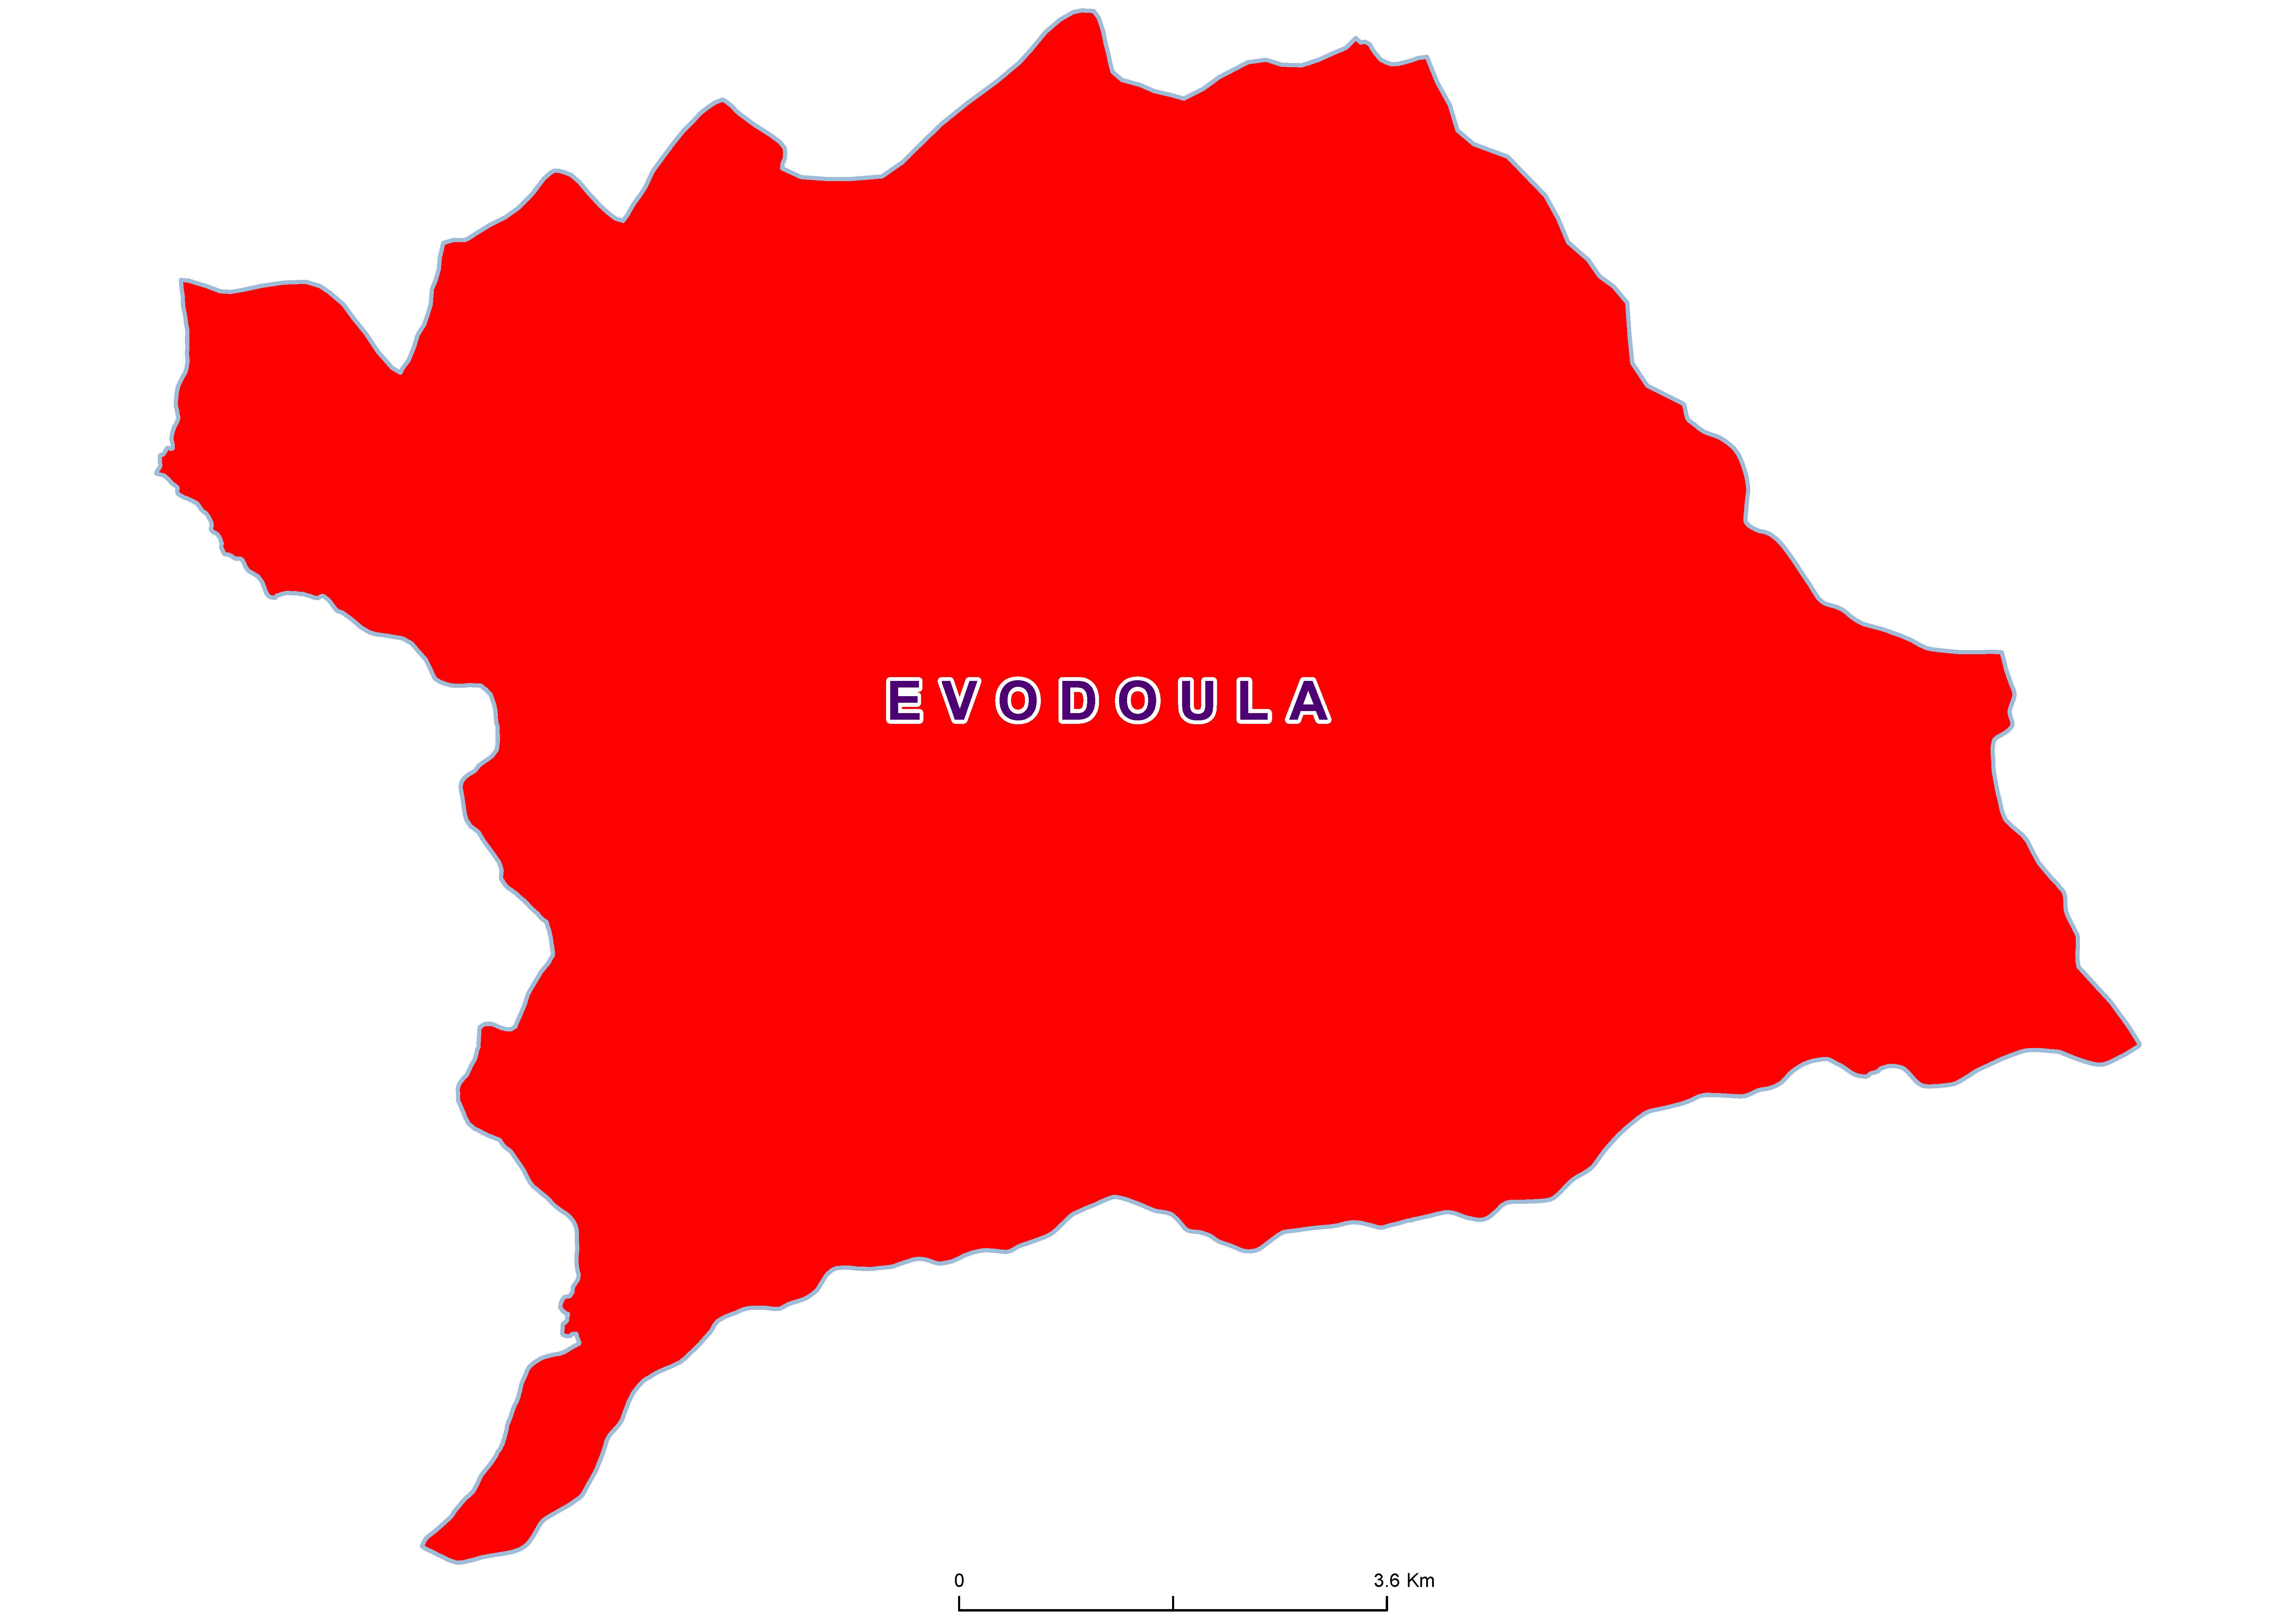 Evodoula Mean STH 20100001